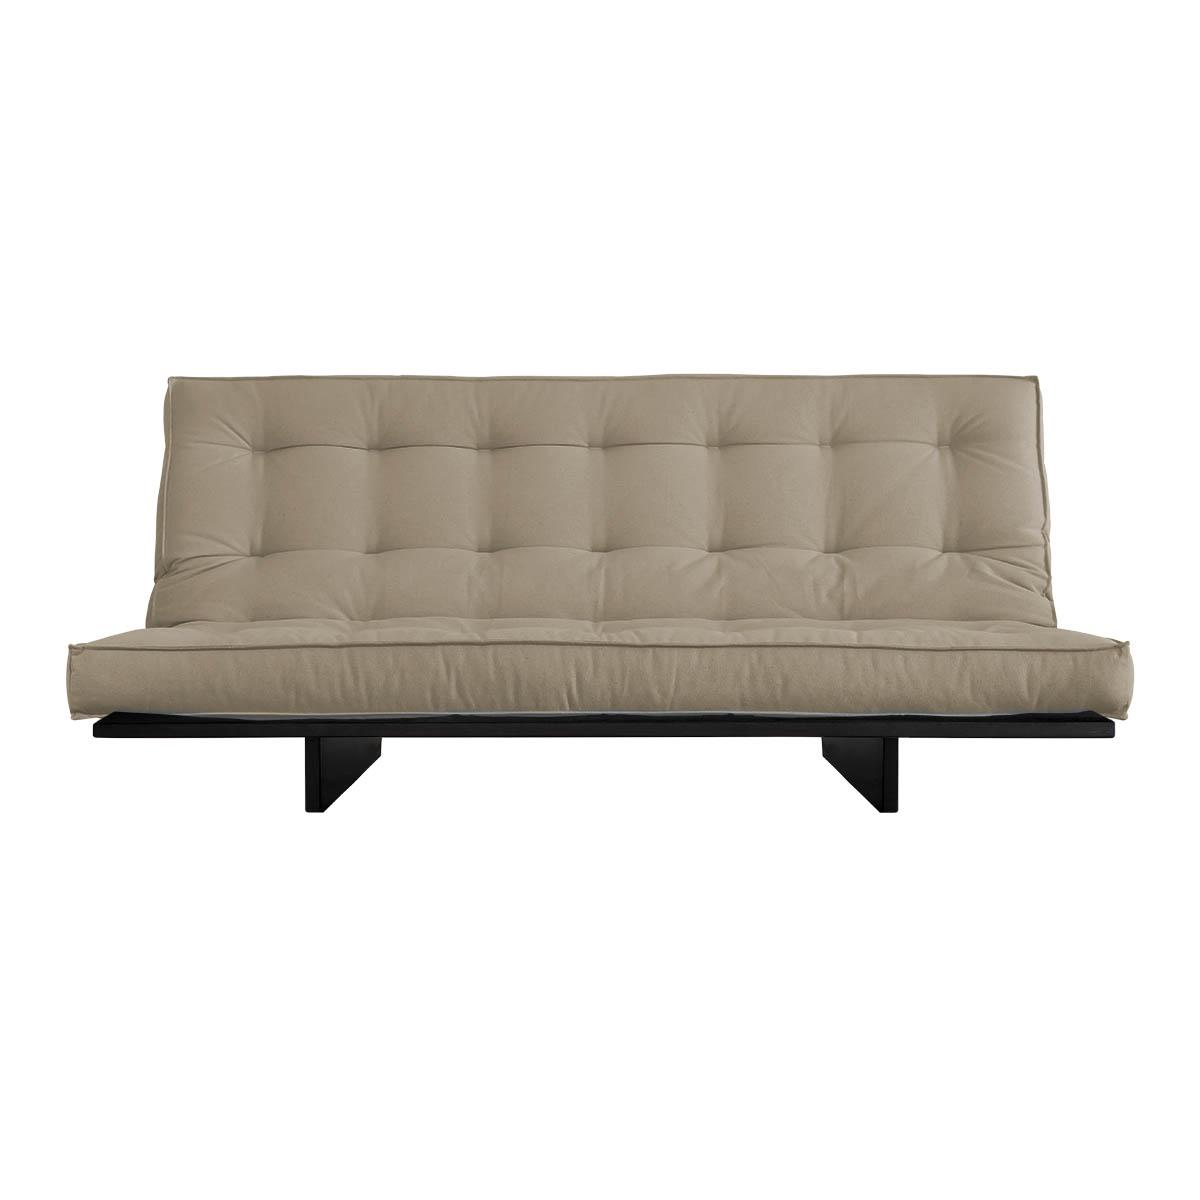 Sofa cama futon barcelona for Sofa cama barato barcelona